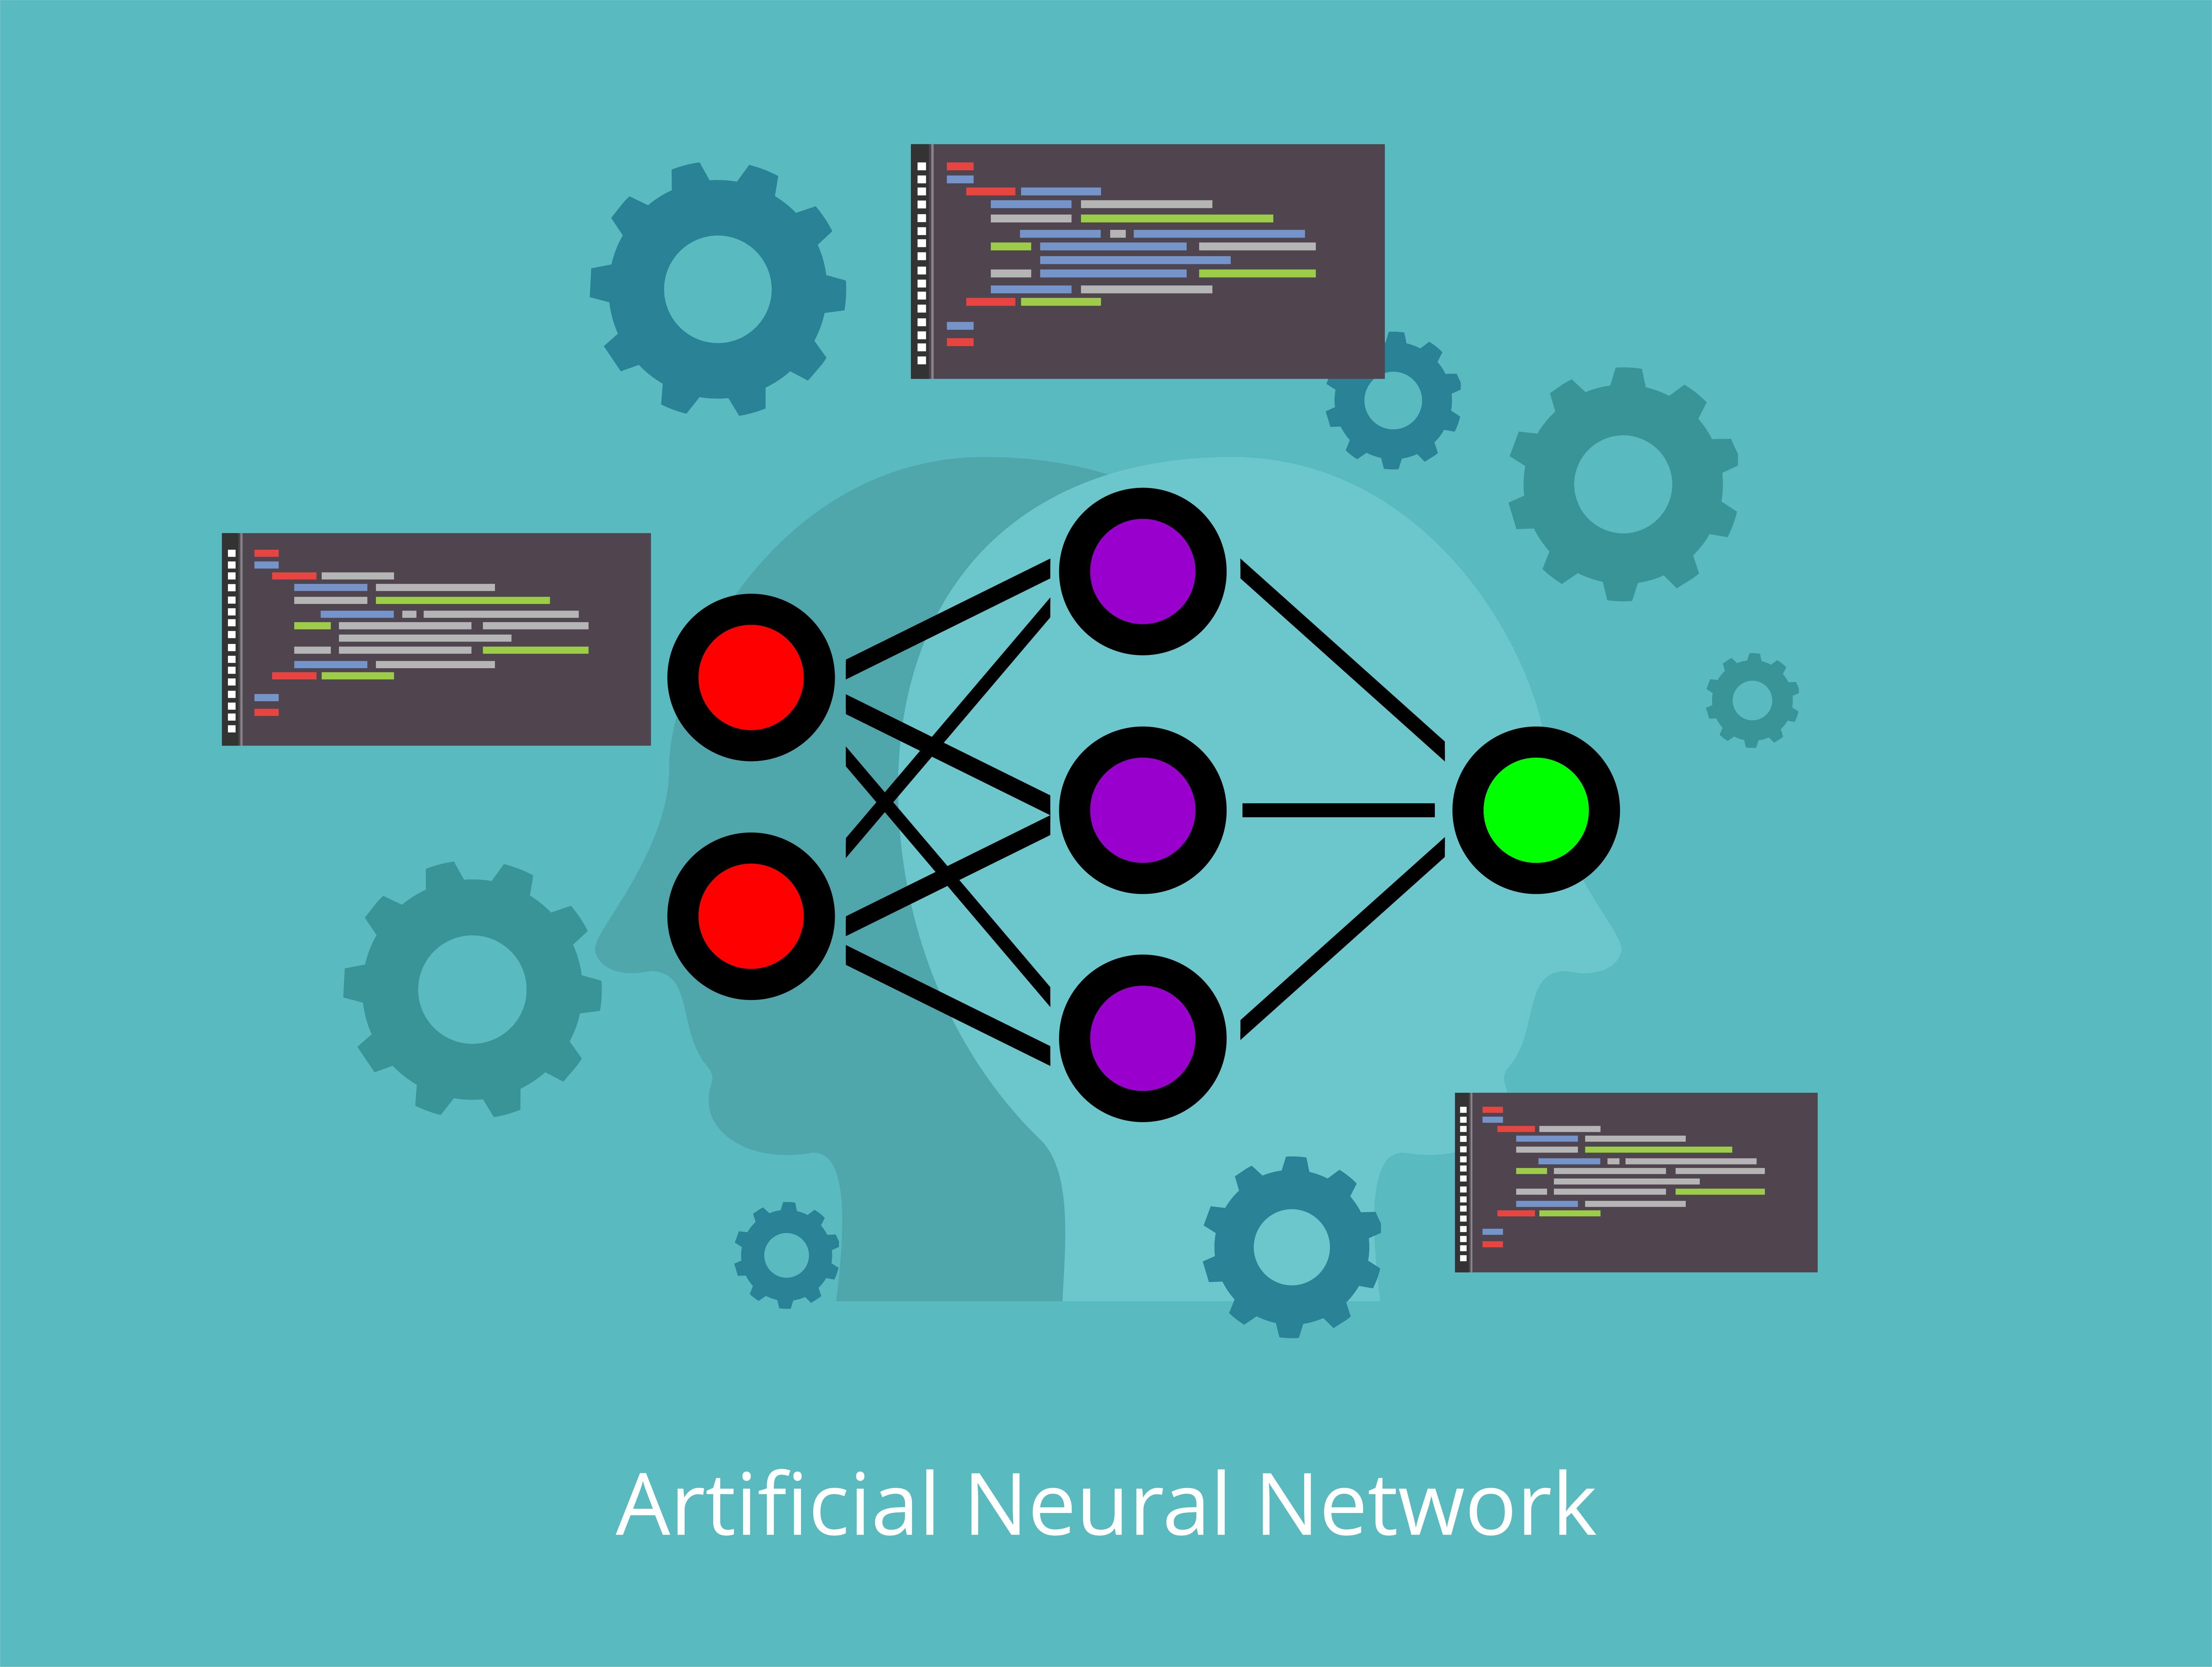 check the post:Core ML vs Tensorflow Lite for a description of the image